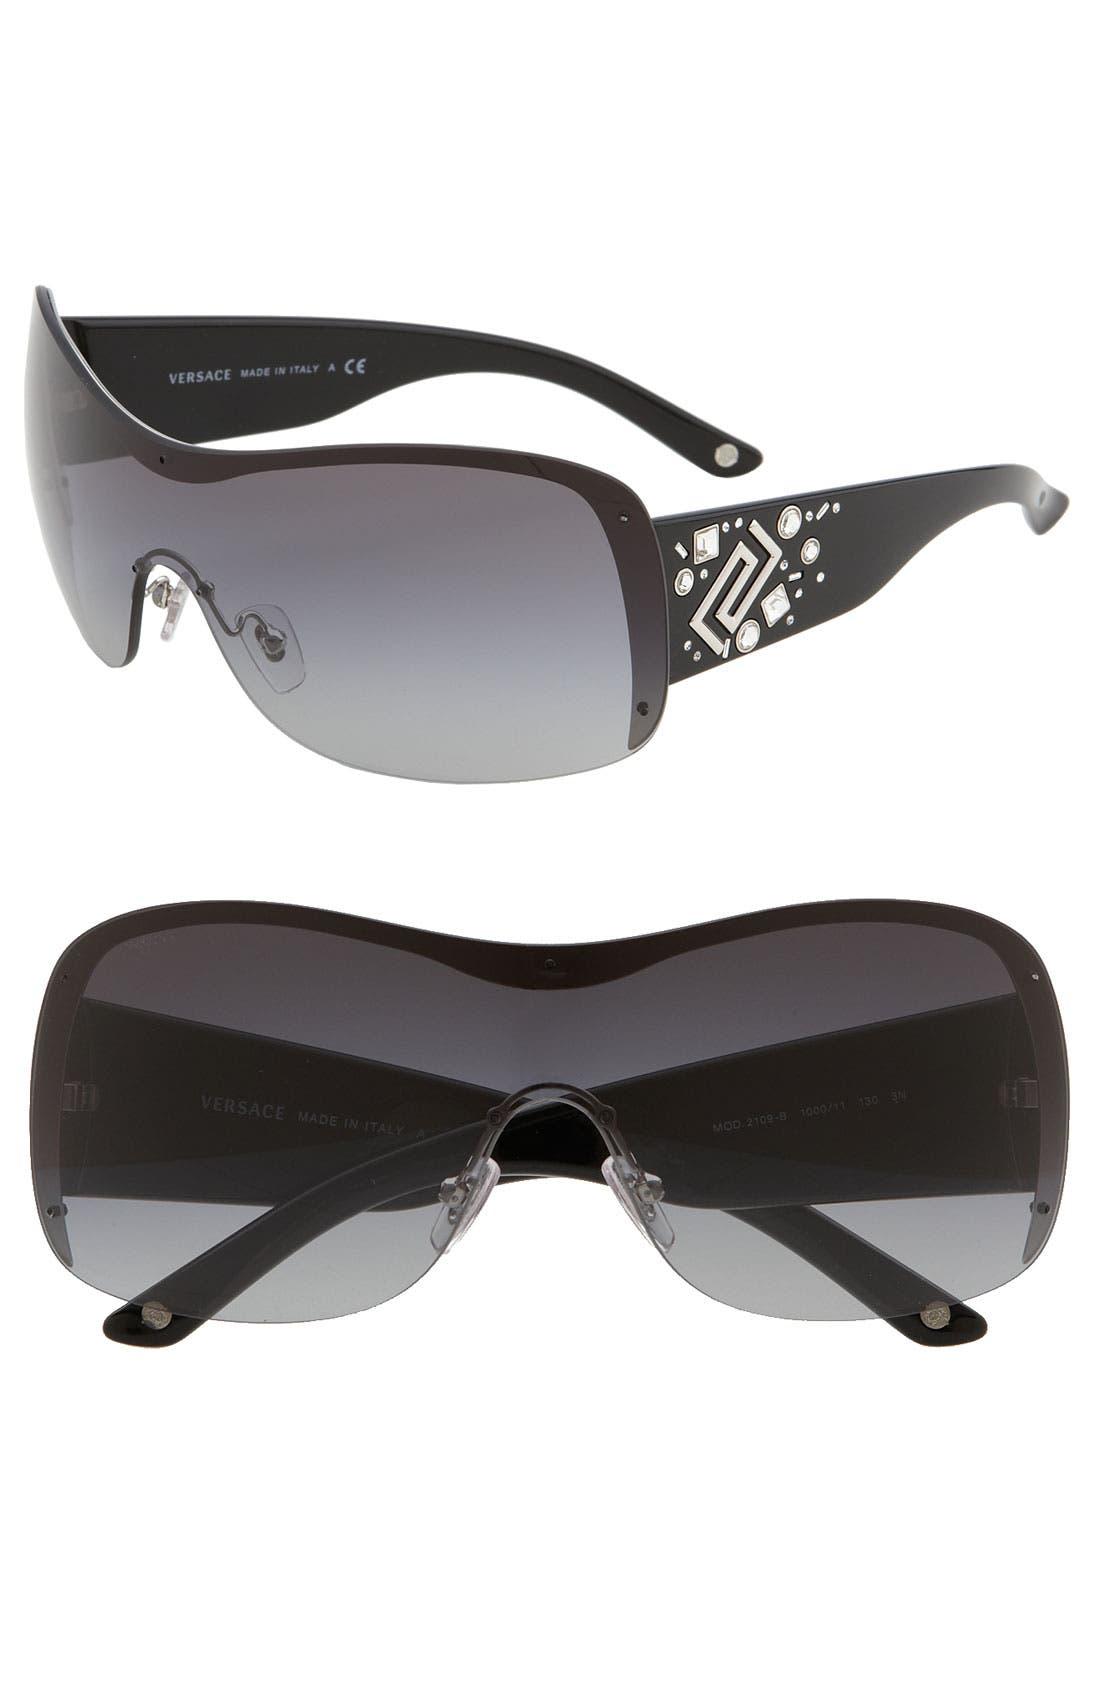 Greek Key Oversized Shield Sunglasses,                             Main thumbnail 1, color,                             020